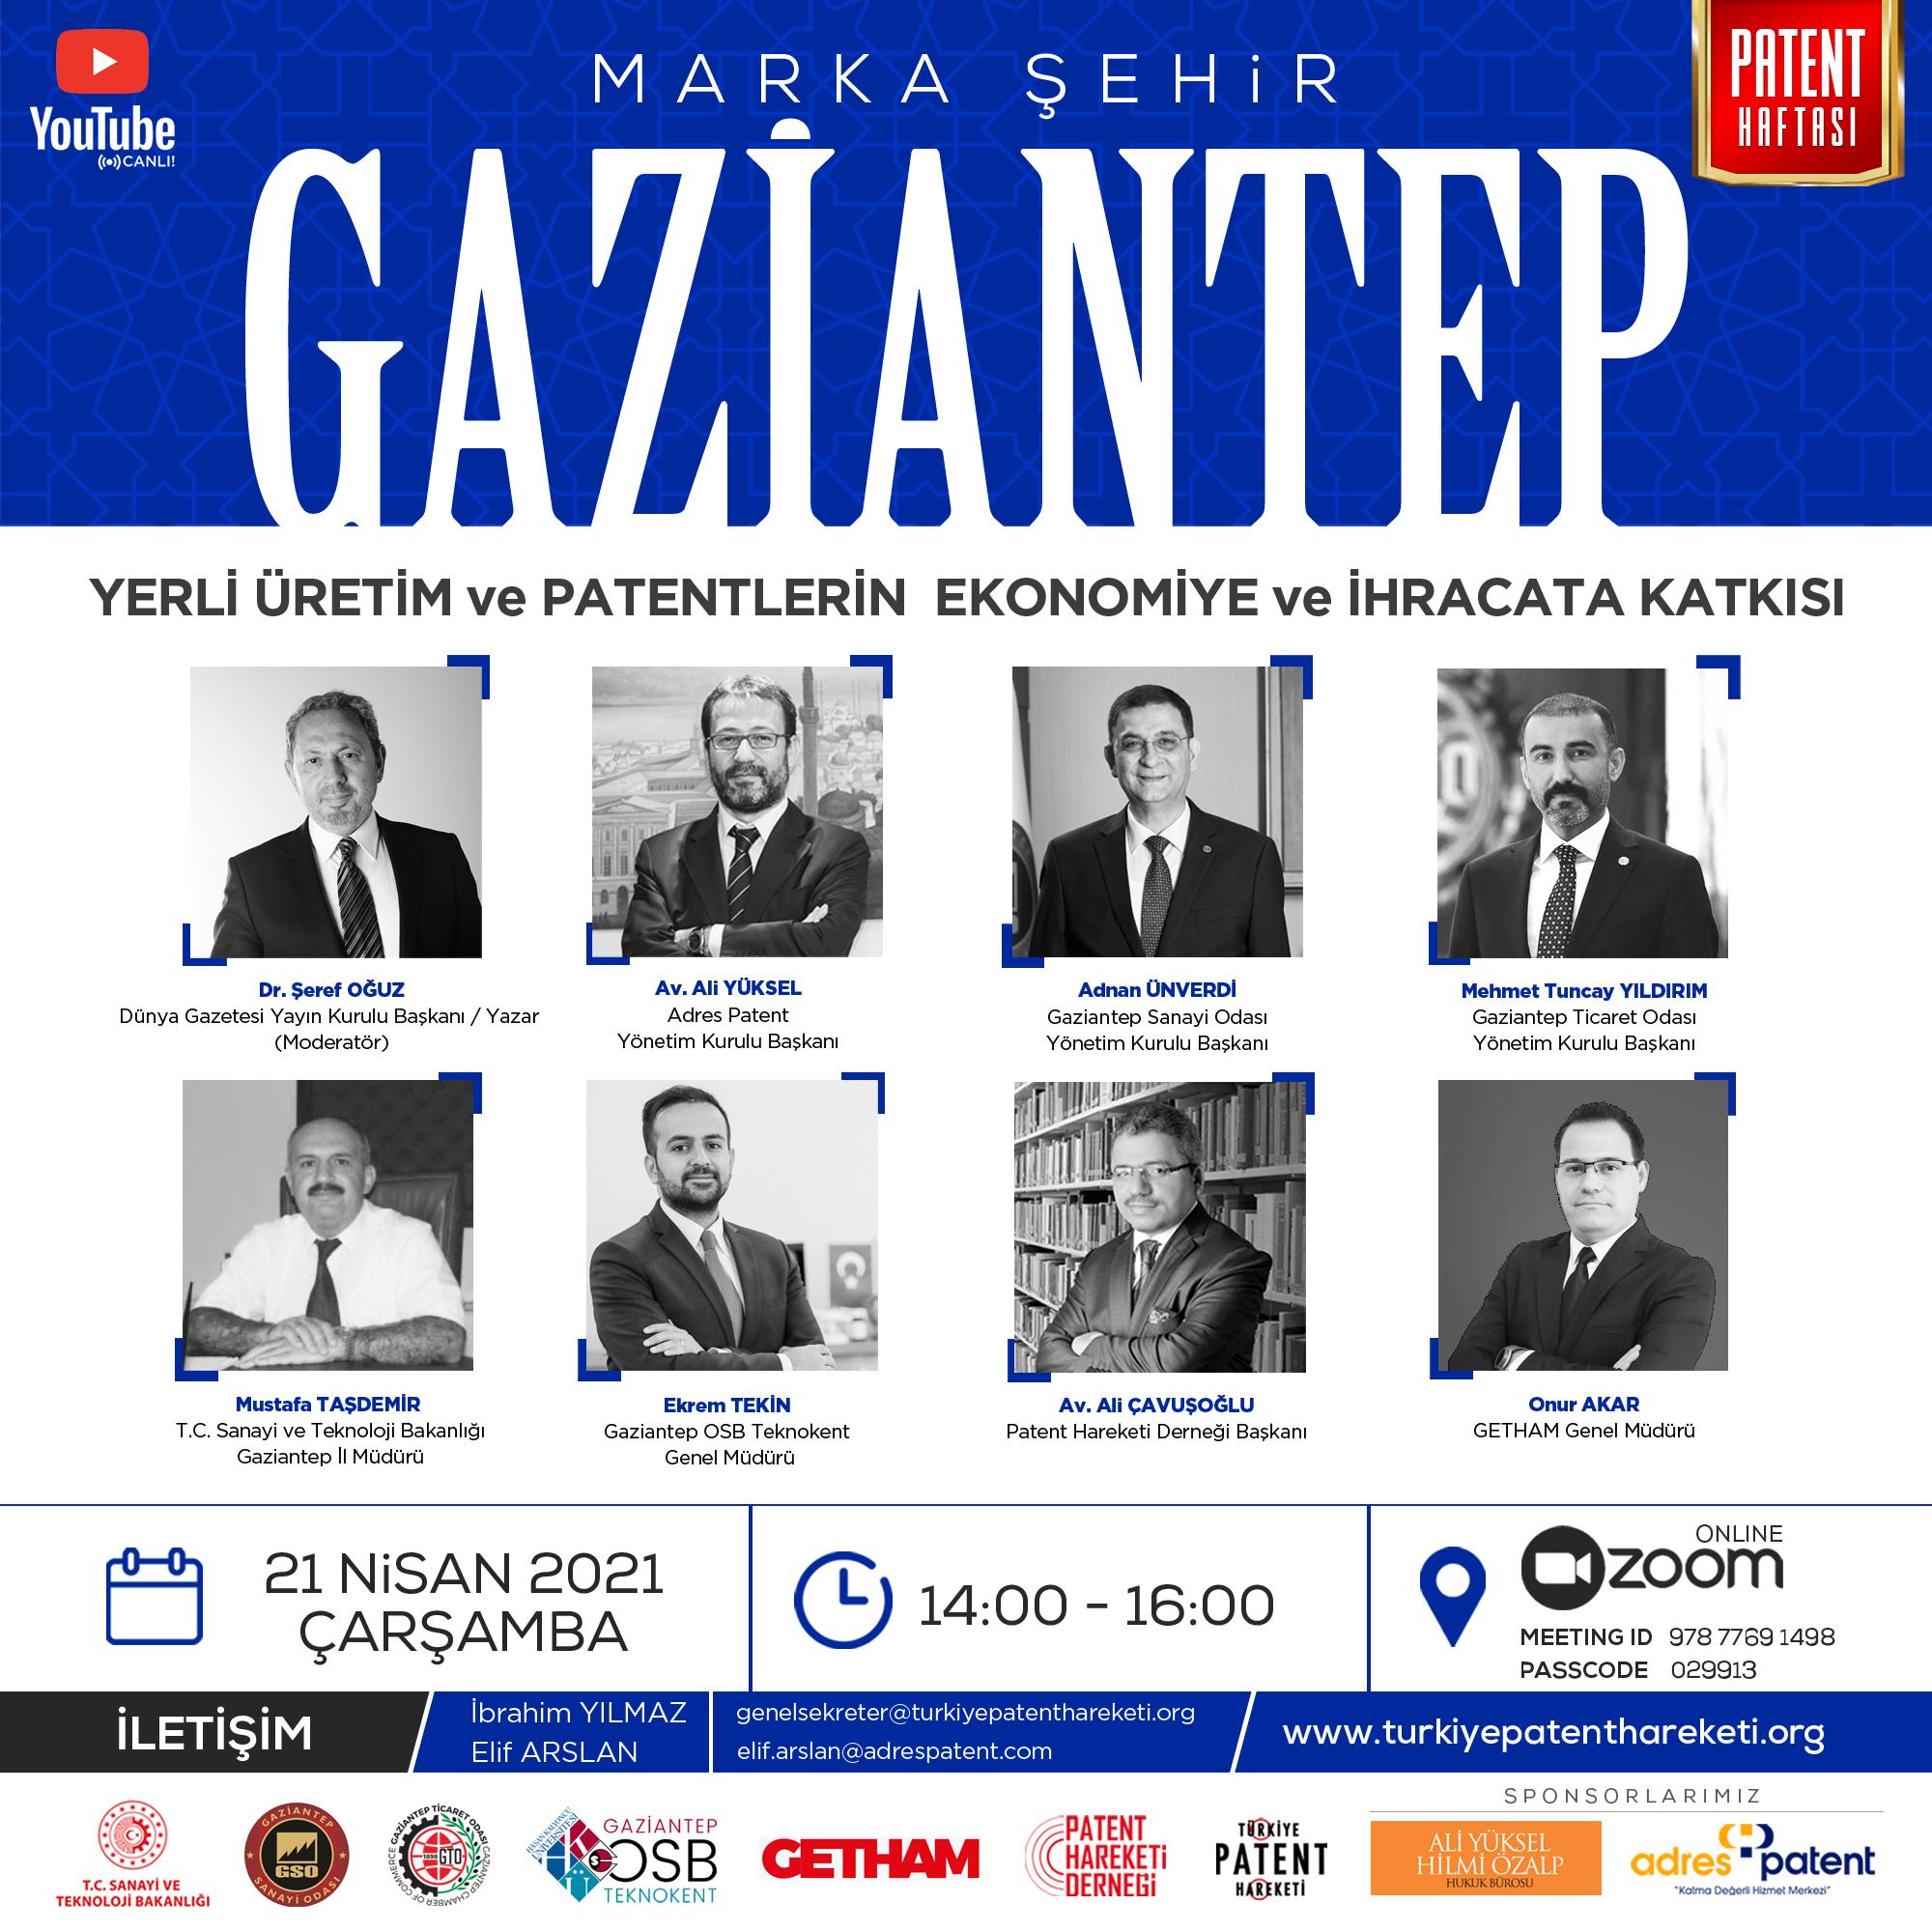 1 milyon patent hedefinin yeni durağı Gaziantep